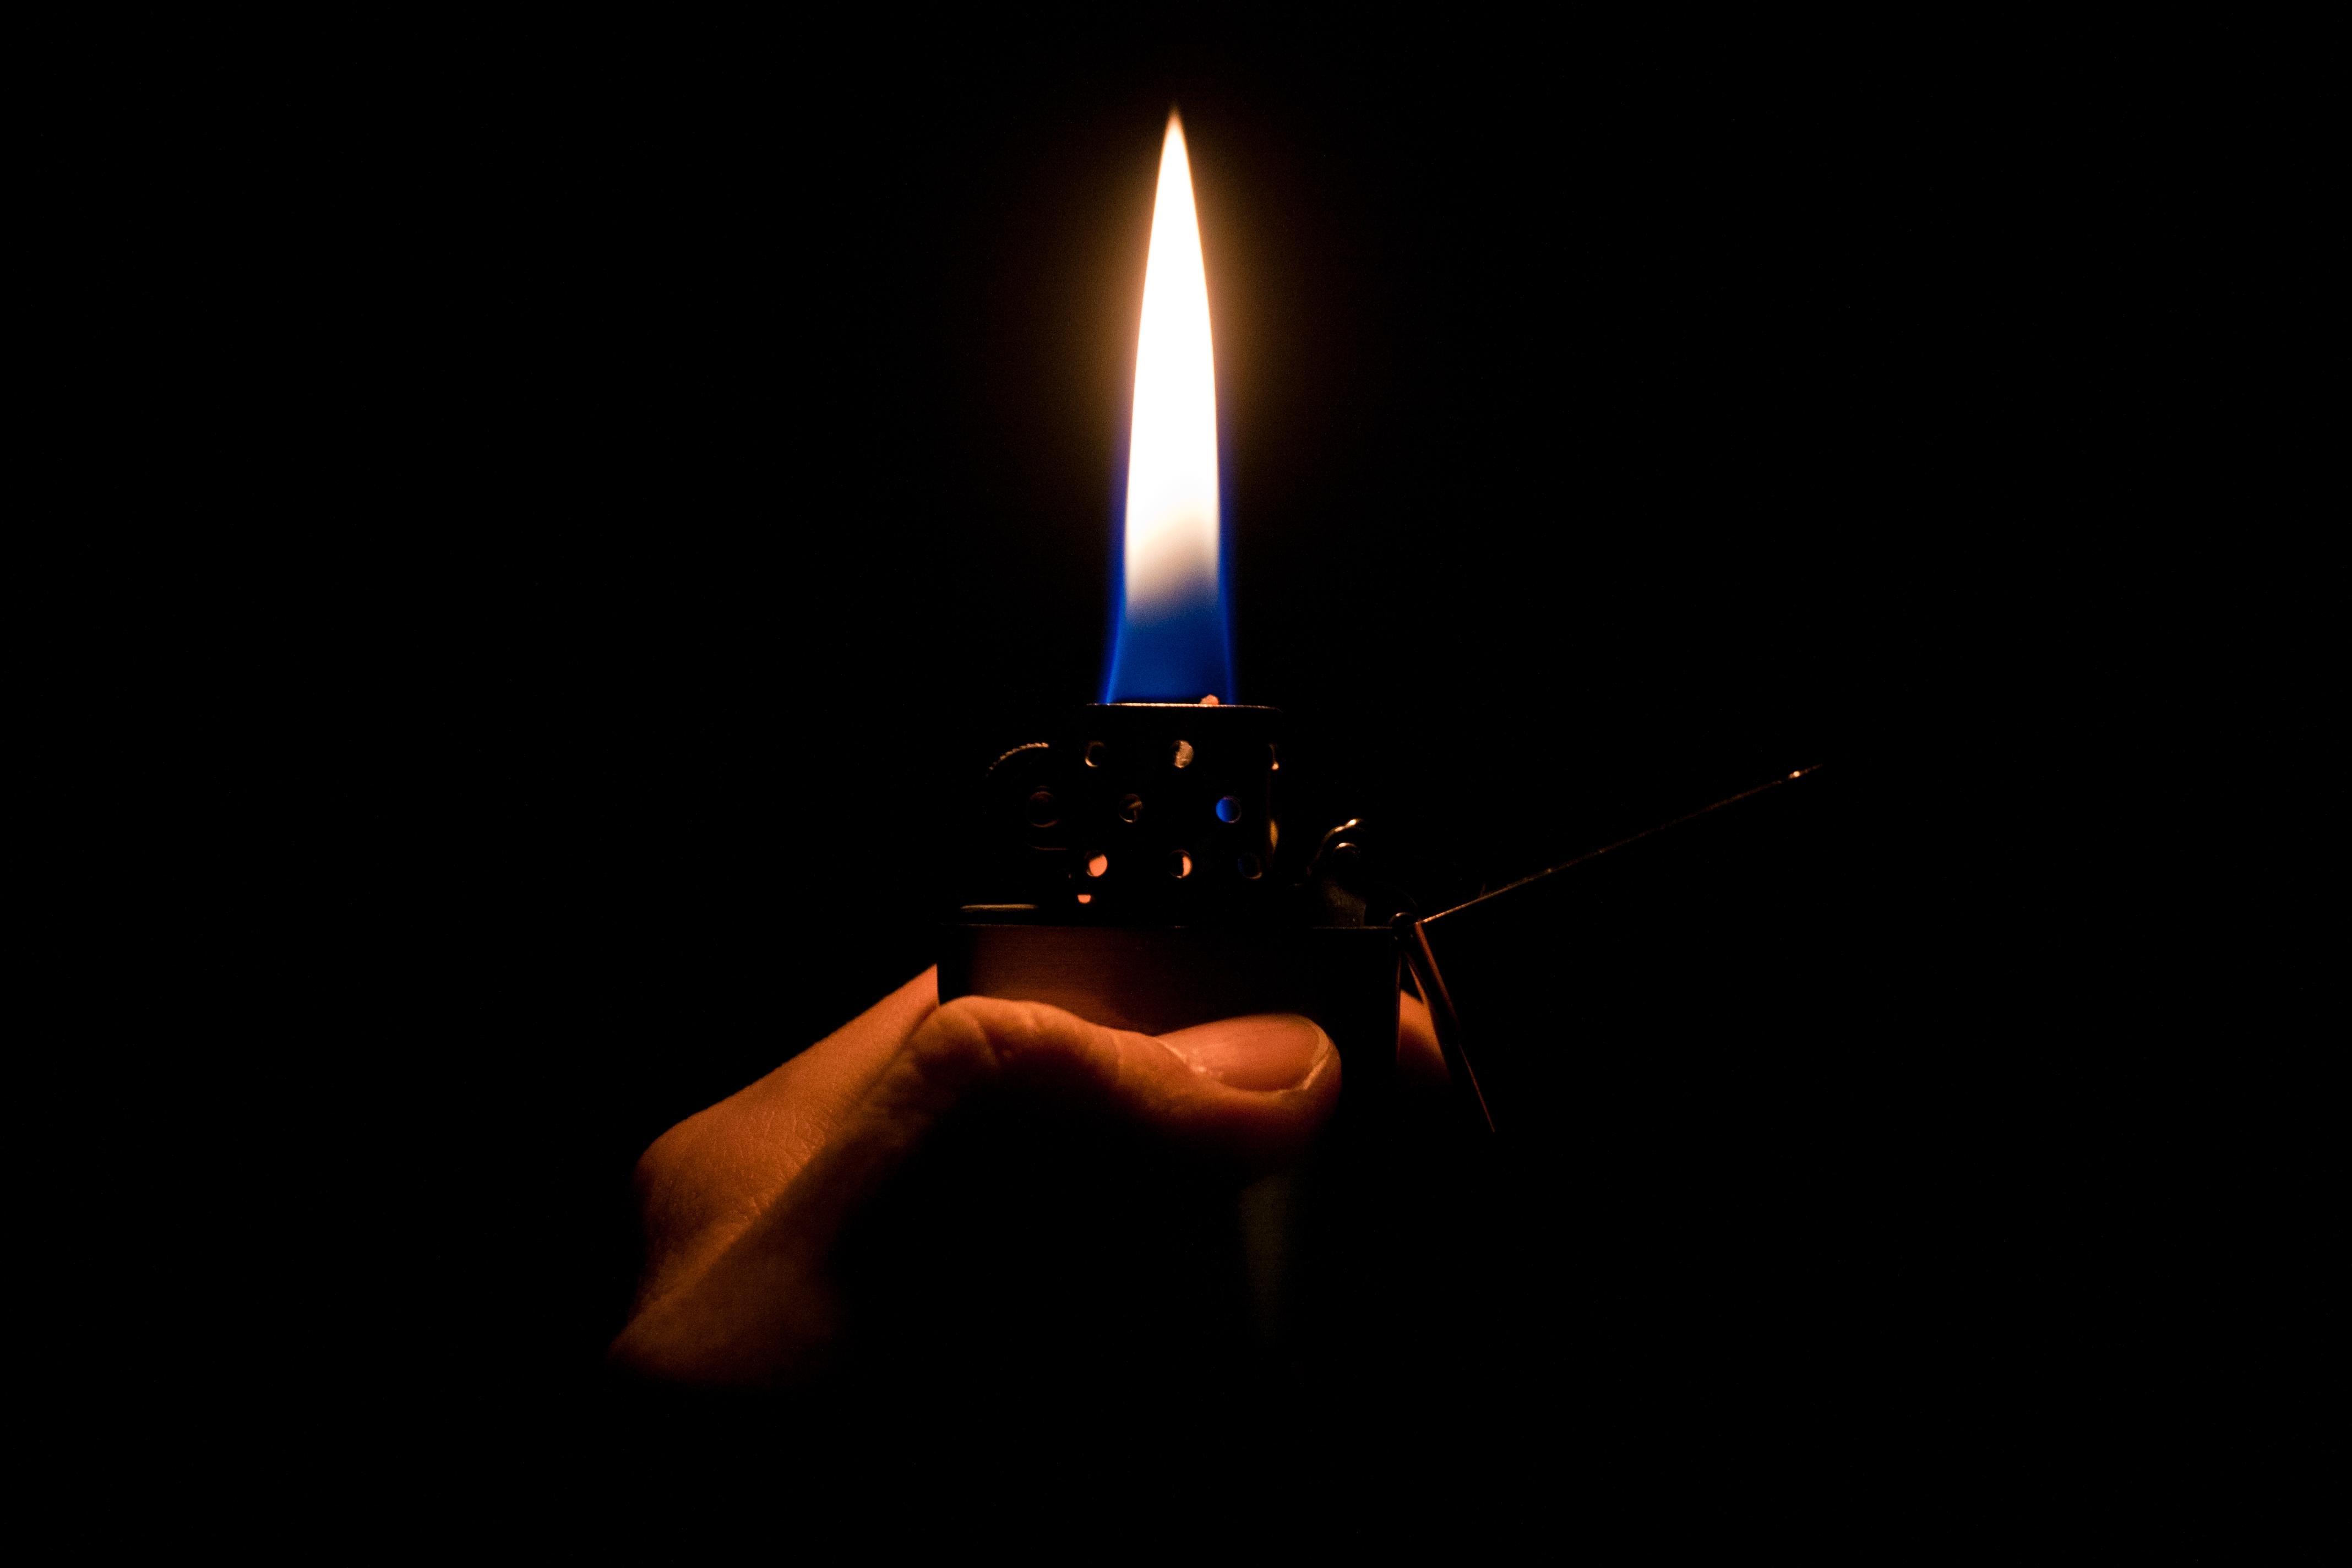 download the acid lighter - photo #3